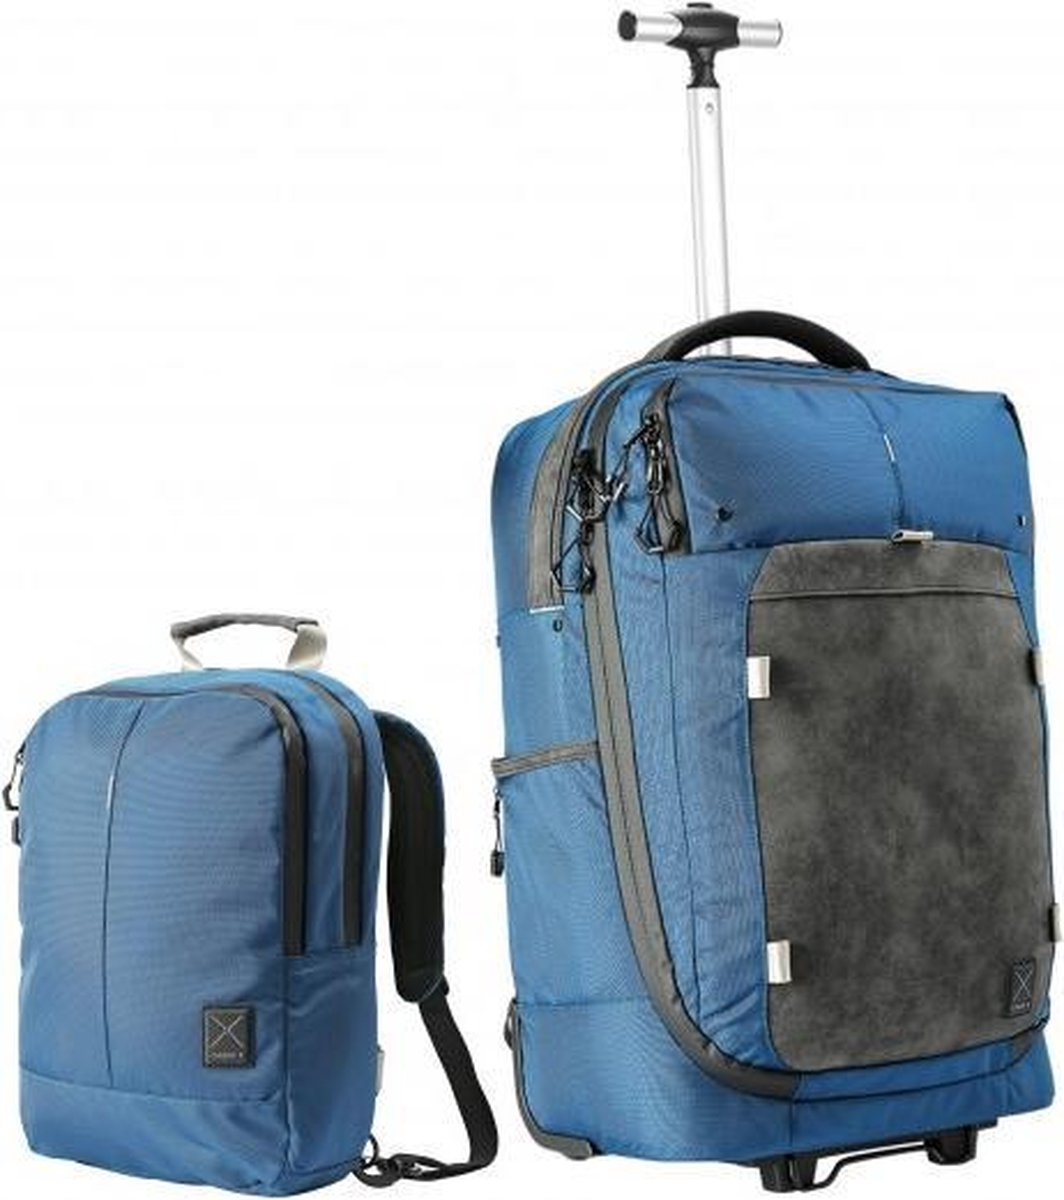 CabinMax X One Hybride Handbagage Koffer - Rugzak - Dagtas - Trolley Reistas - Handbagagekoffer 38L